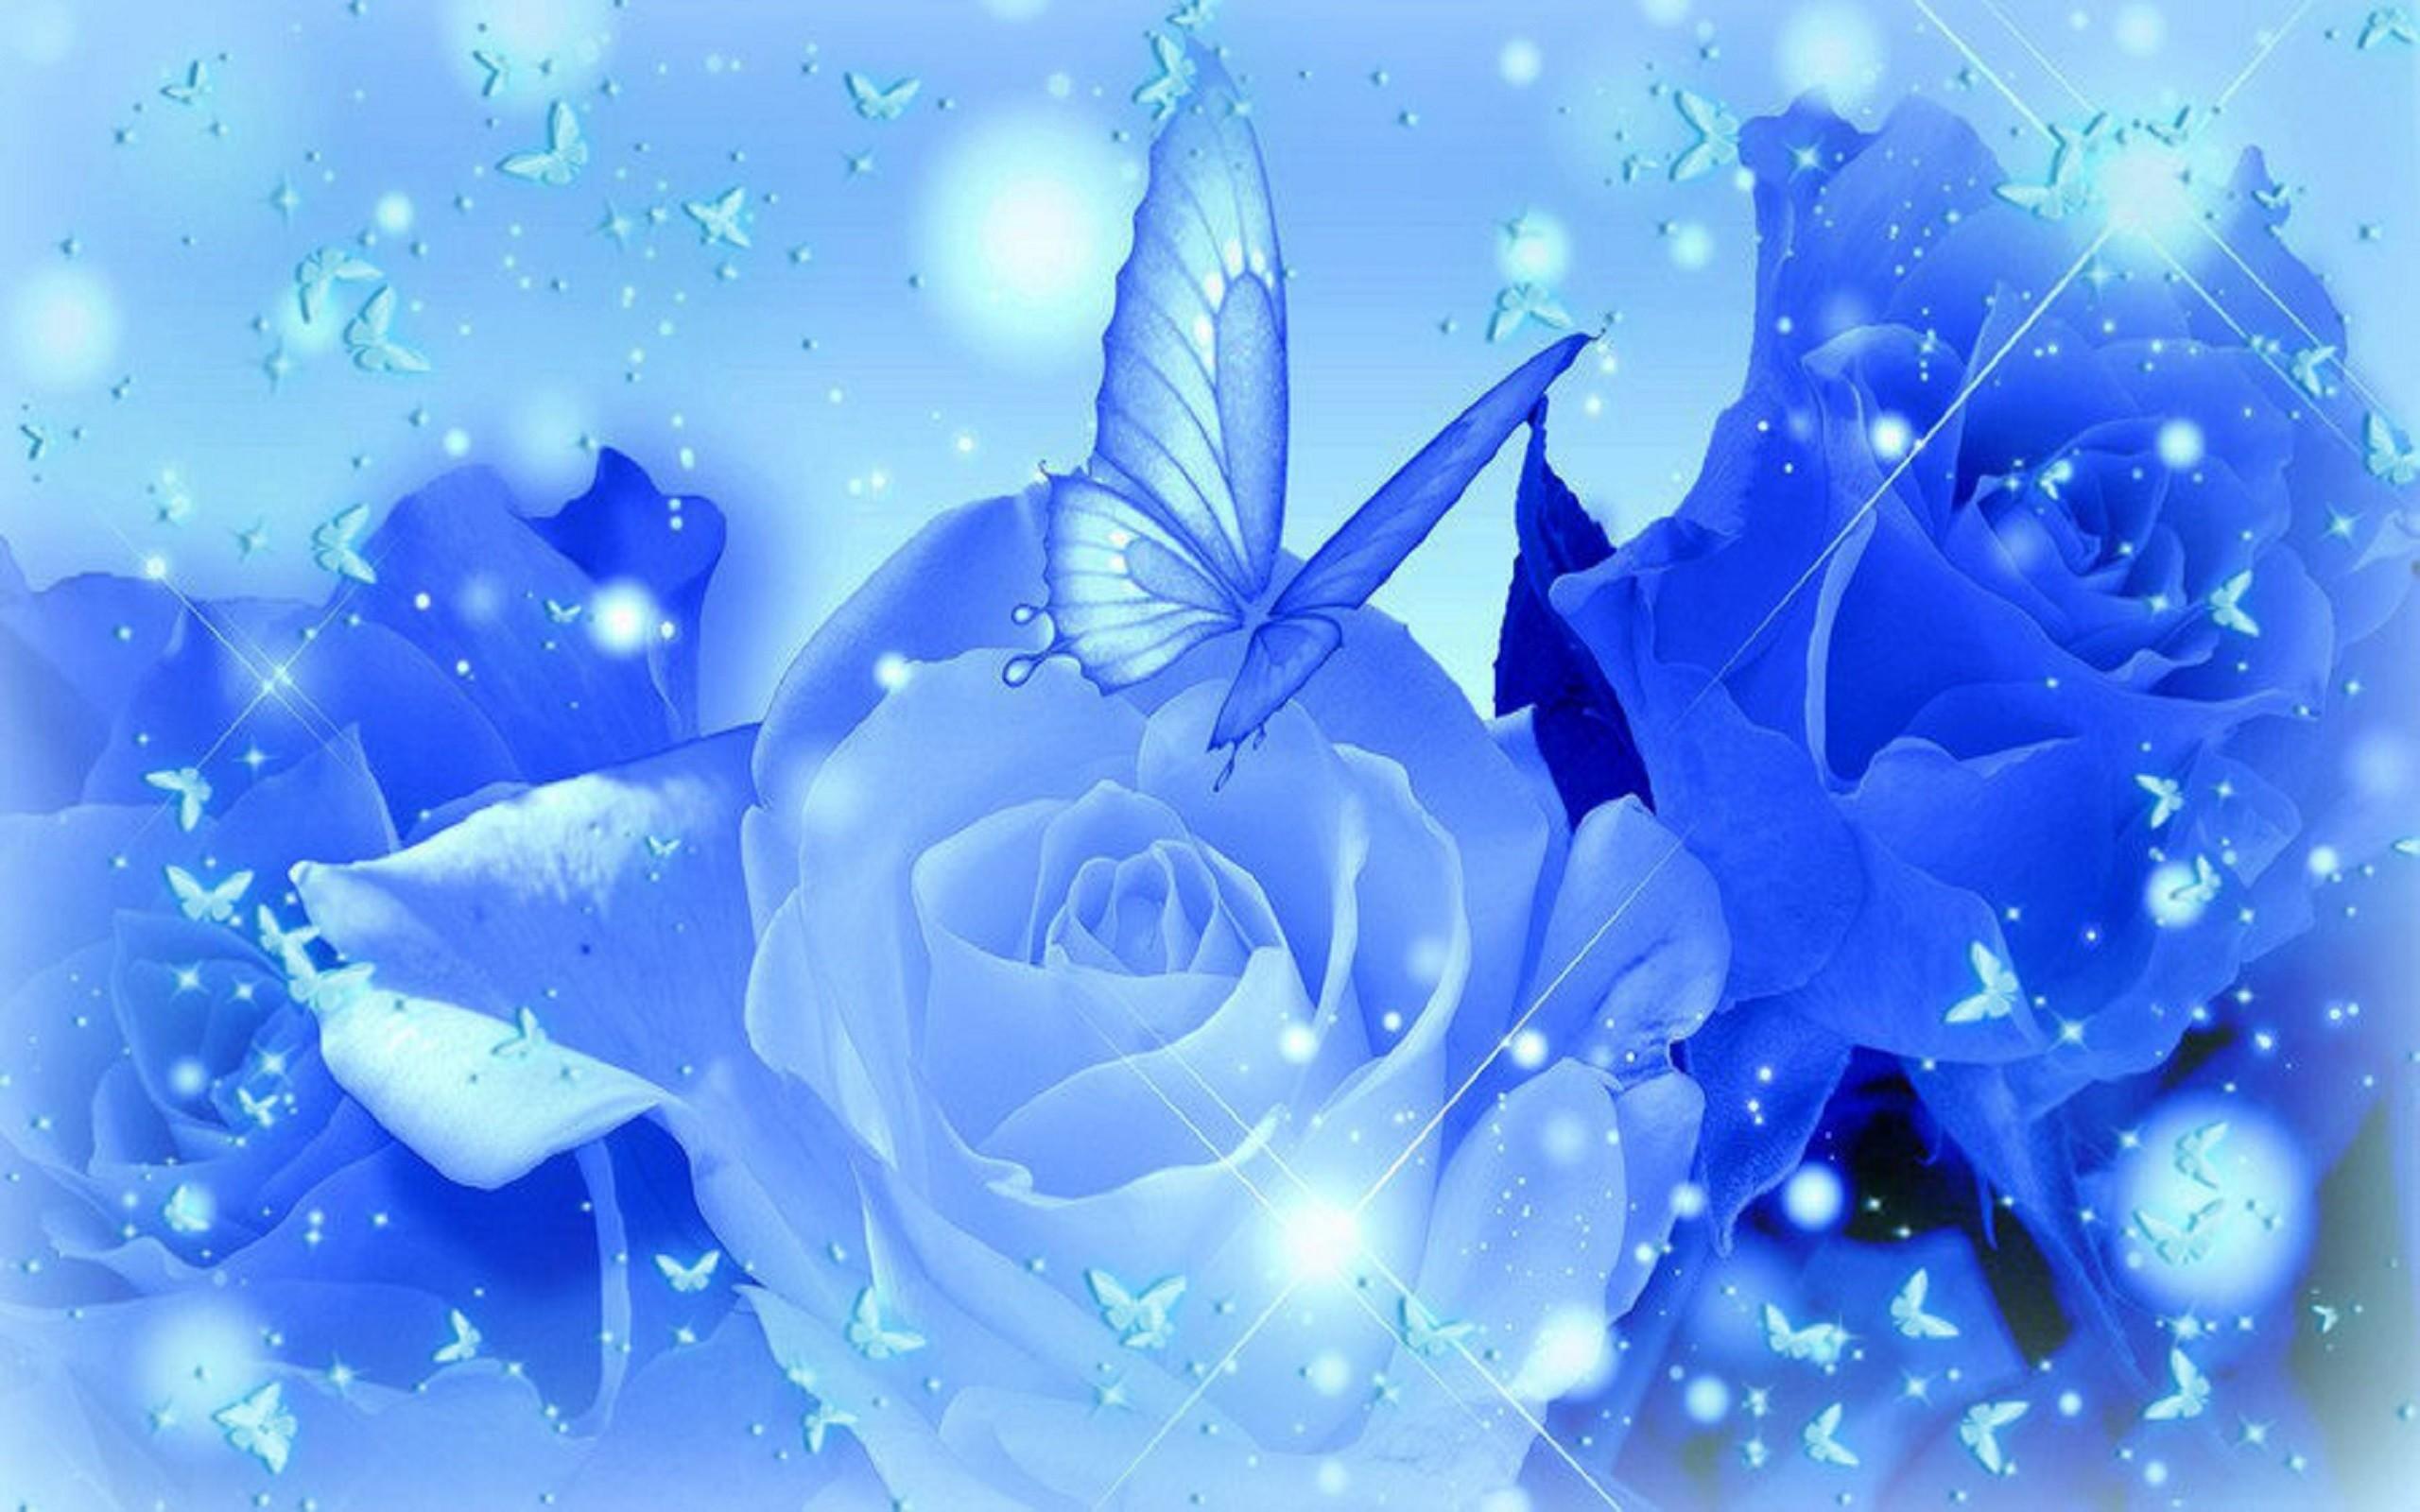 Blue-Rose-Desktop-Wallpapers-HD.jpg (2560×1600) | blue flowers | Pinterest  | Blue roses